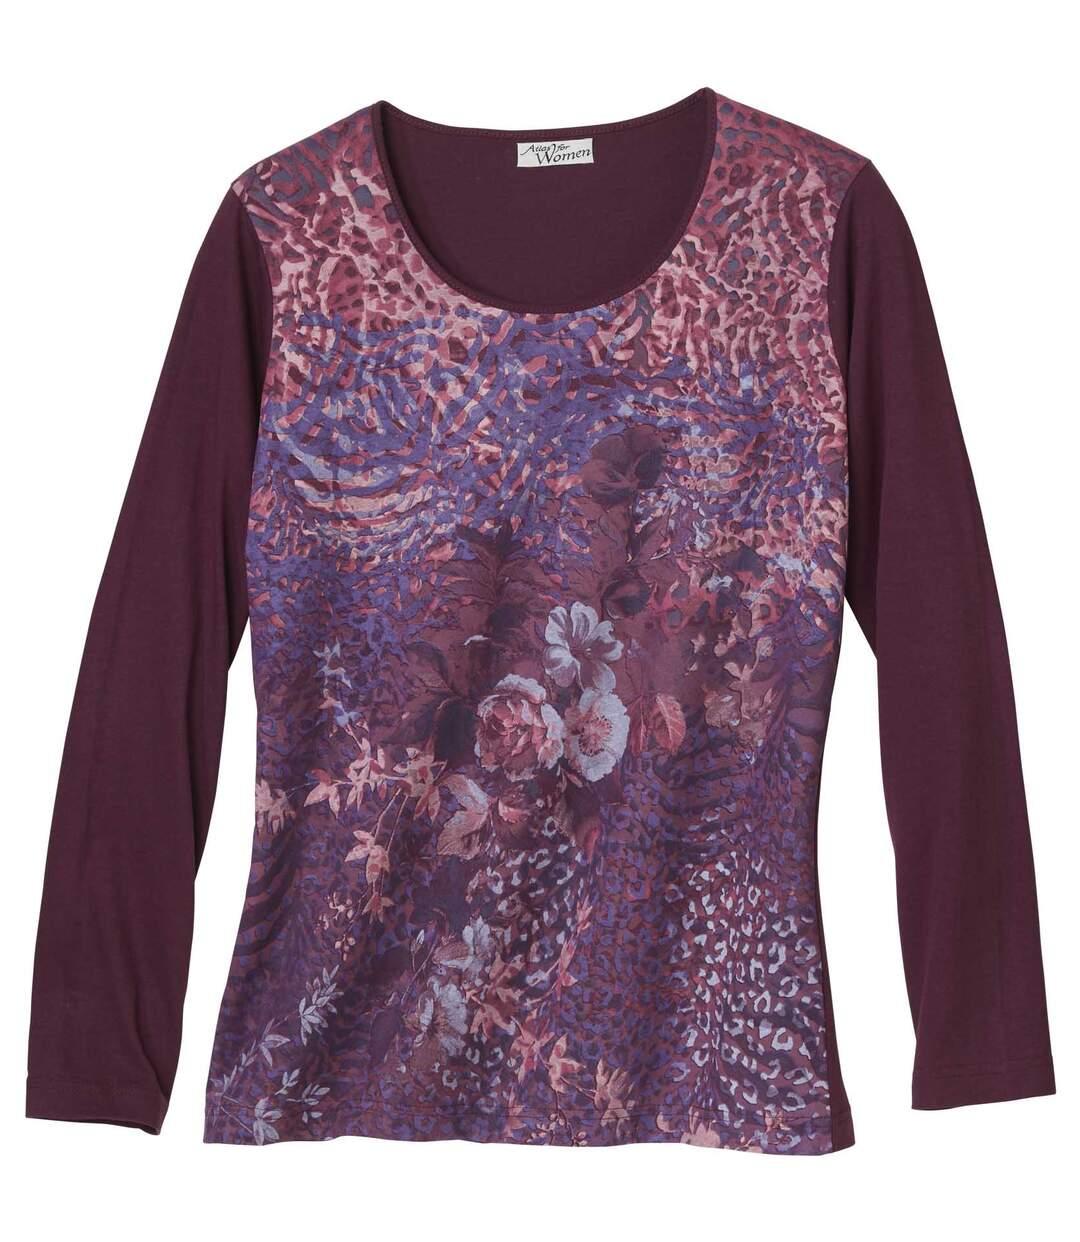 Women's Long Sleeve Plum Top - Floral Zebra Leopard Print